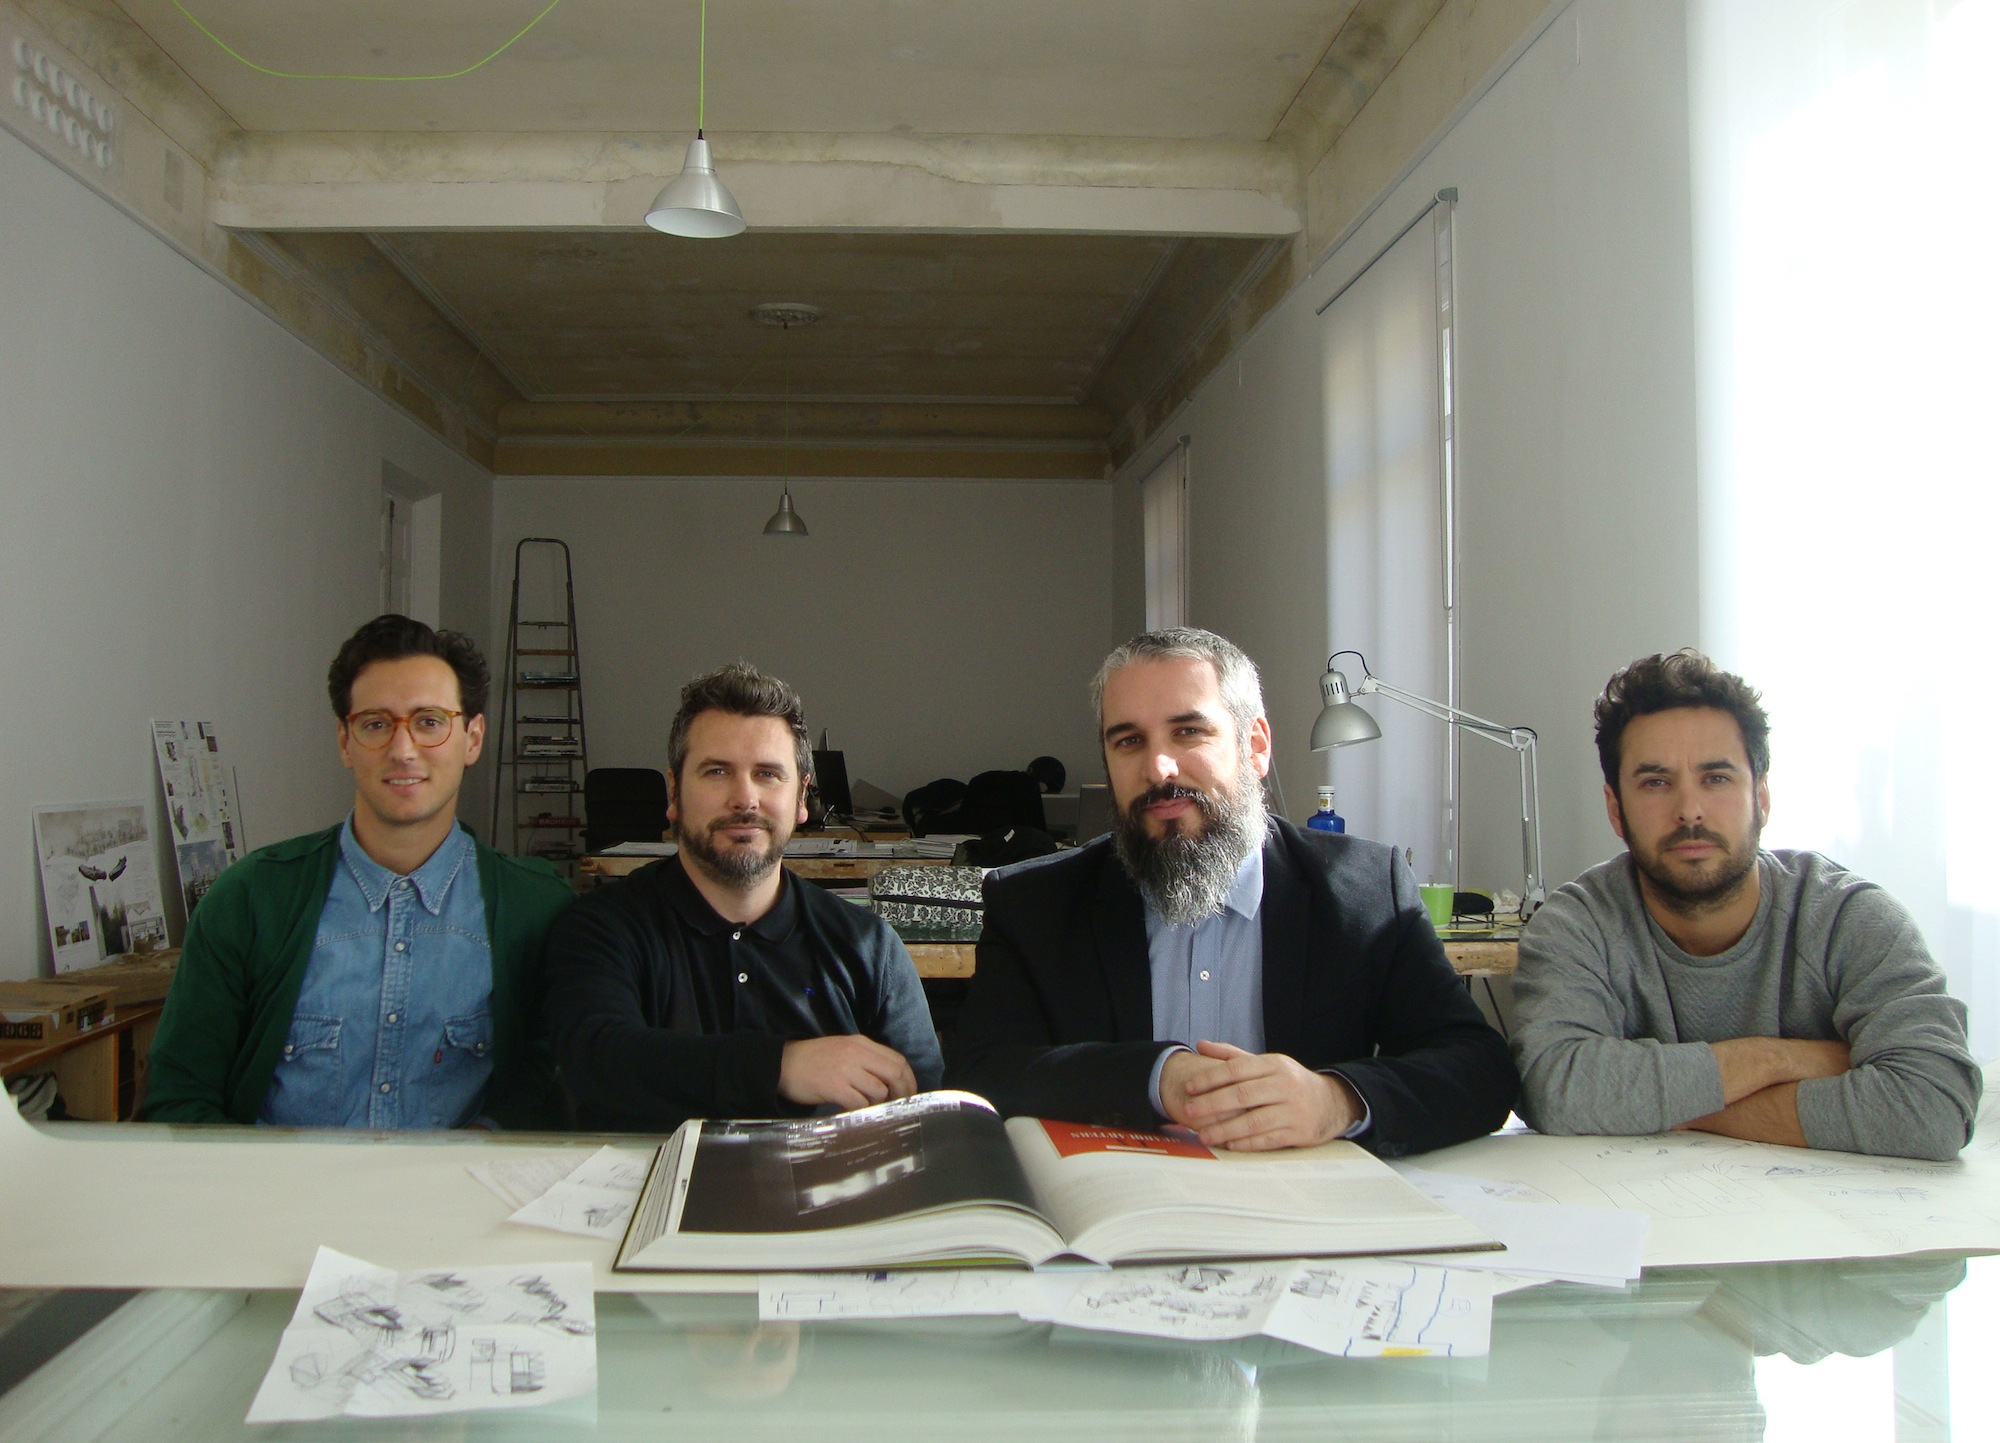 1st Prize:      SM14079   José Luis Concha Jerónimo, Alvaro Gor Gómez, Carlos Gor Gómez, Agustín Gor Gómez (SPAIN)